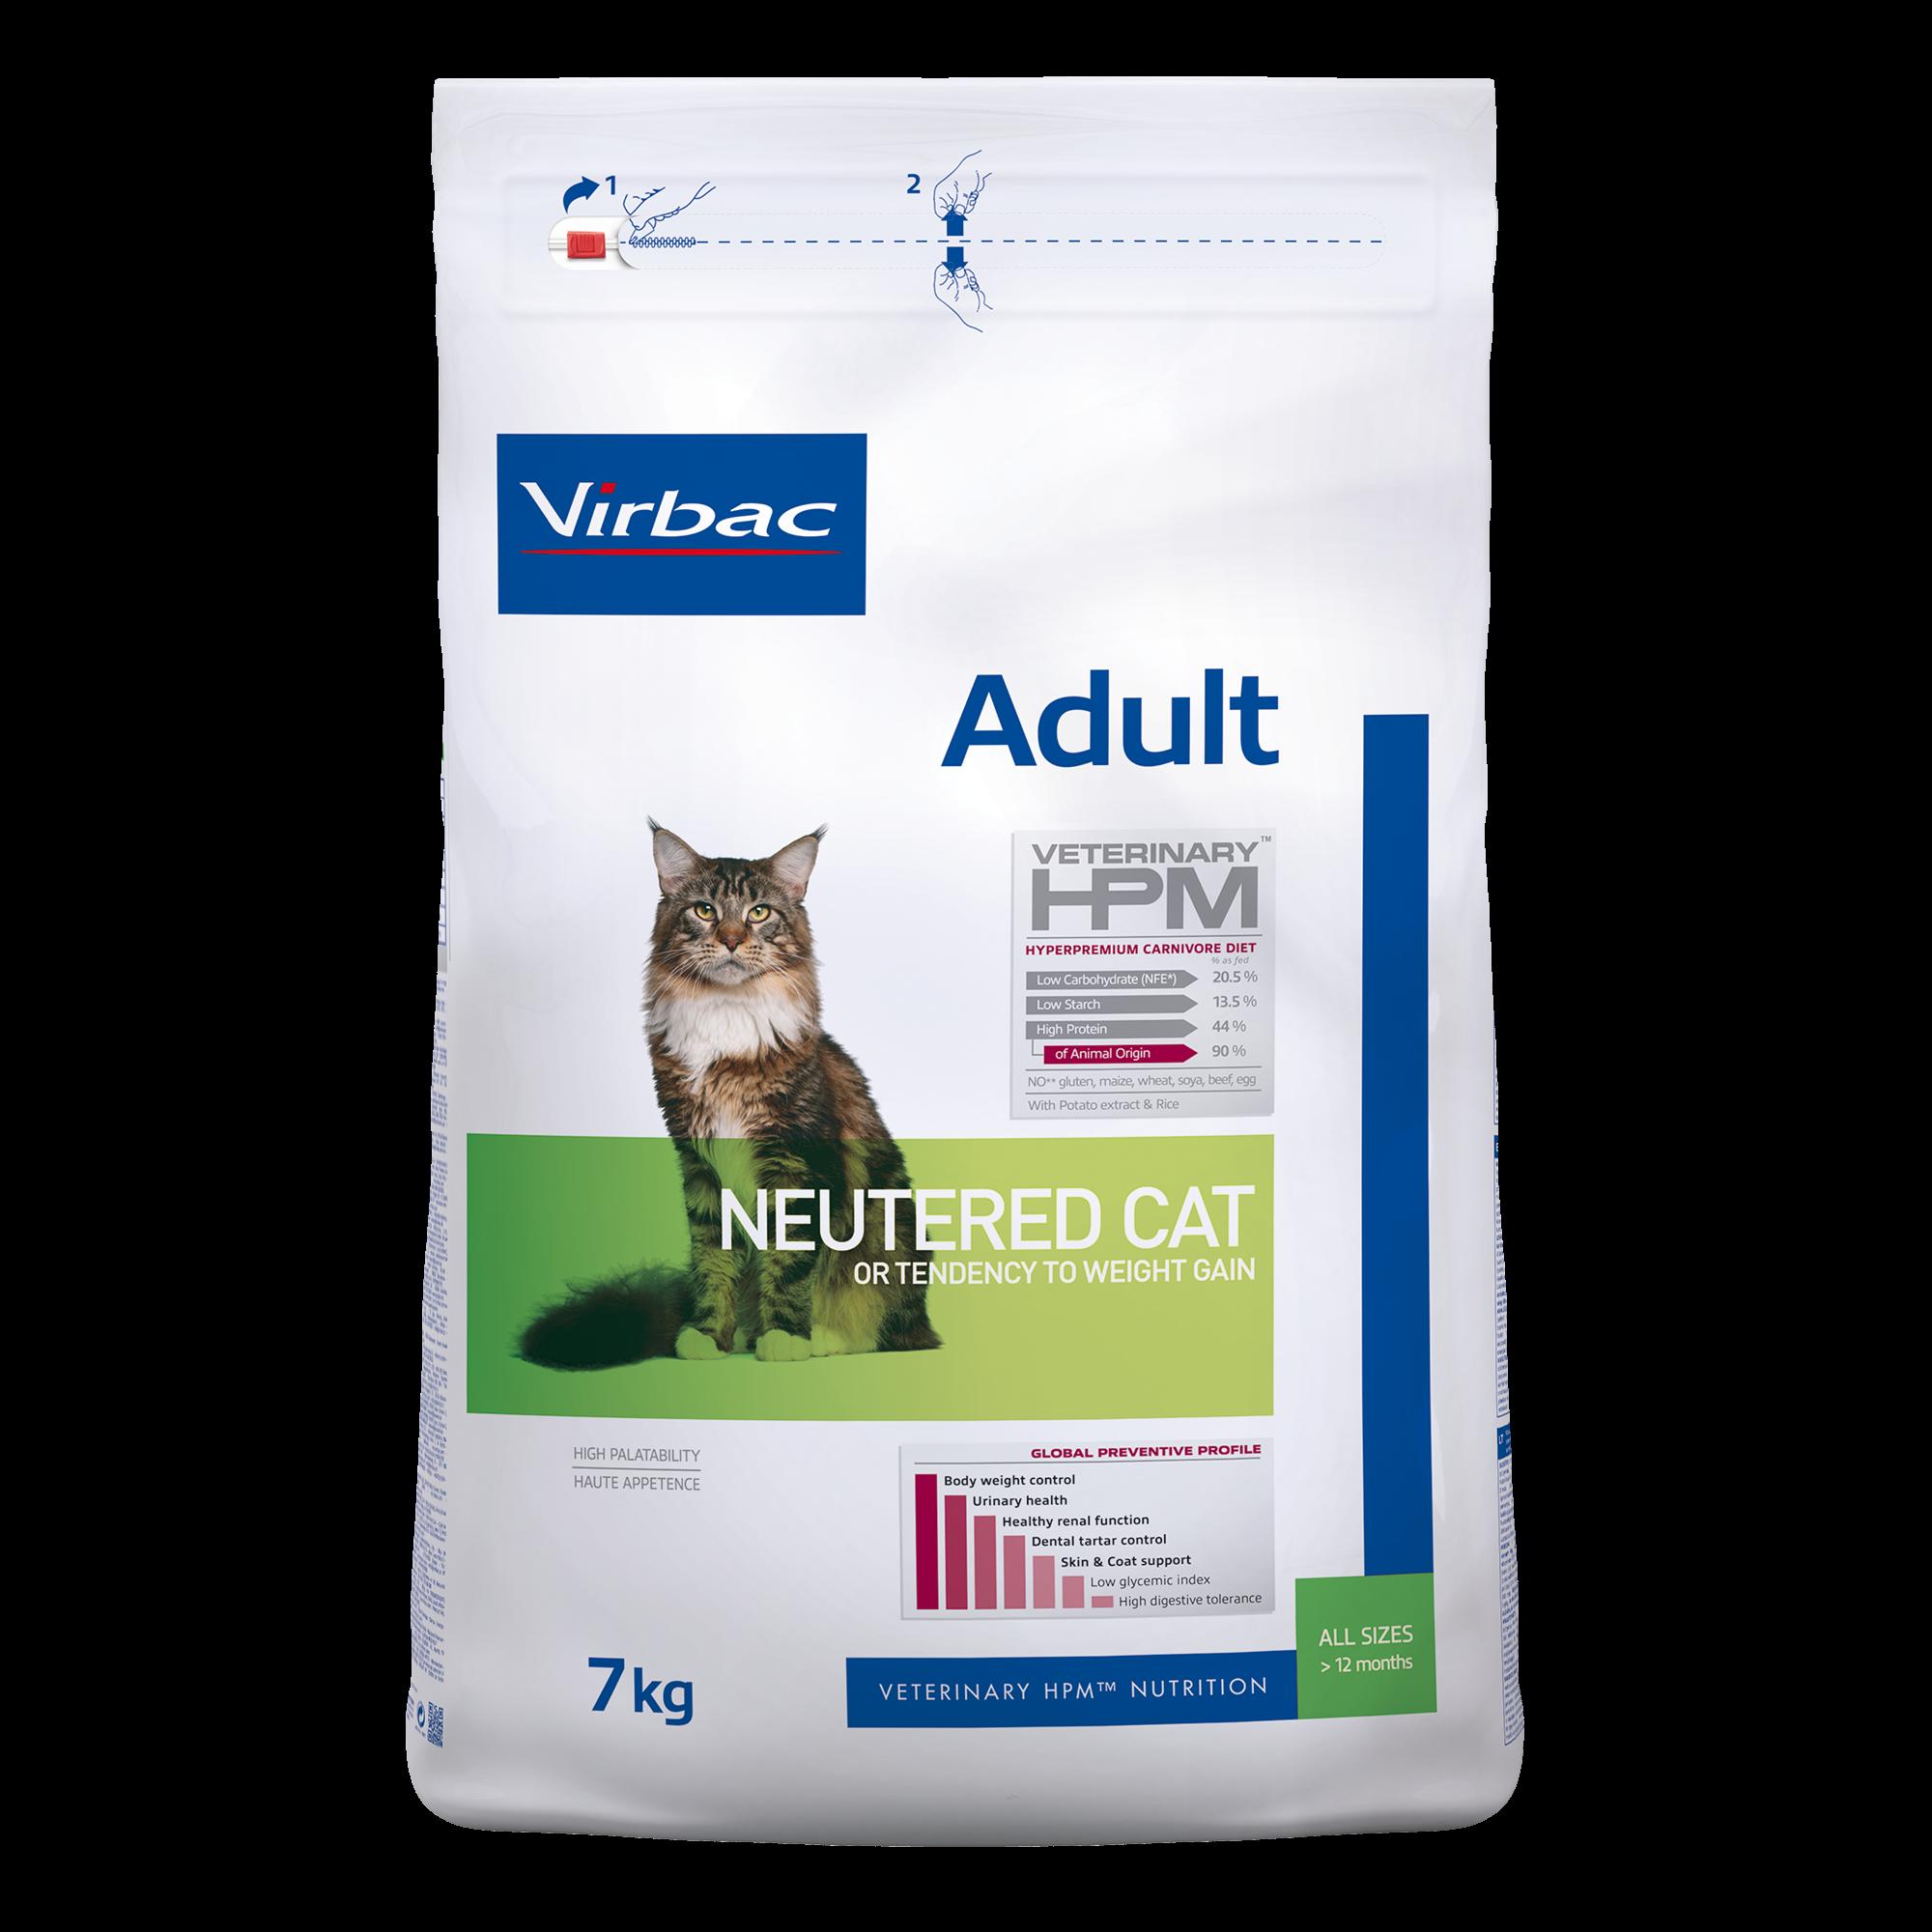 Adult Neutered Cat - 7 kg